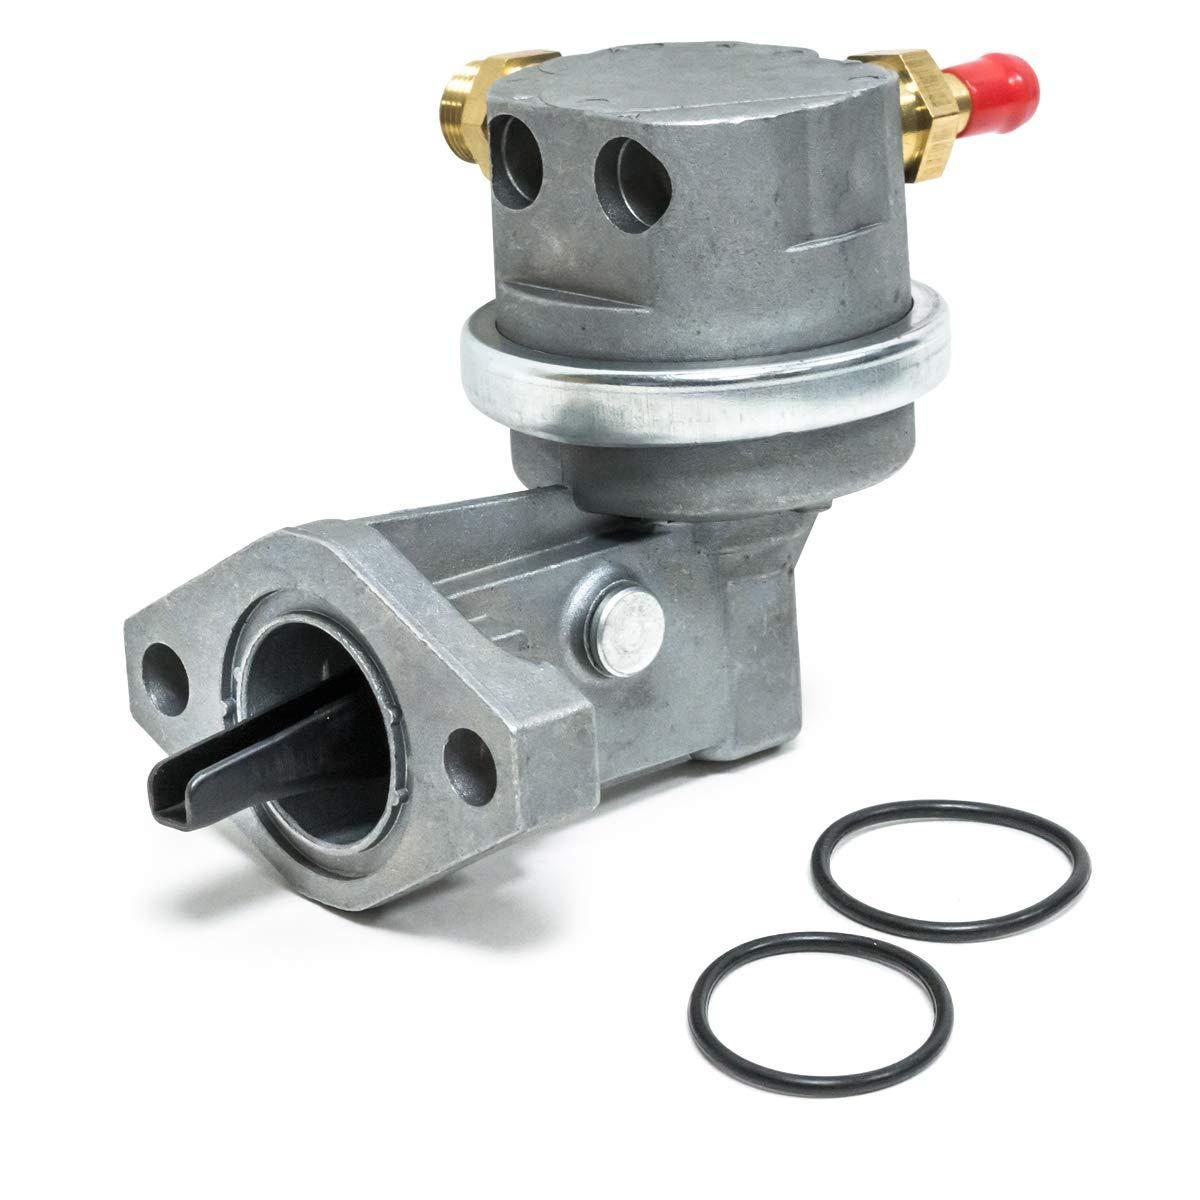 Fuel lift Pump for RE68345 John Deere 5410 5415 5420 5510 5520 5615 7410 7610